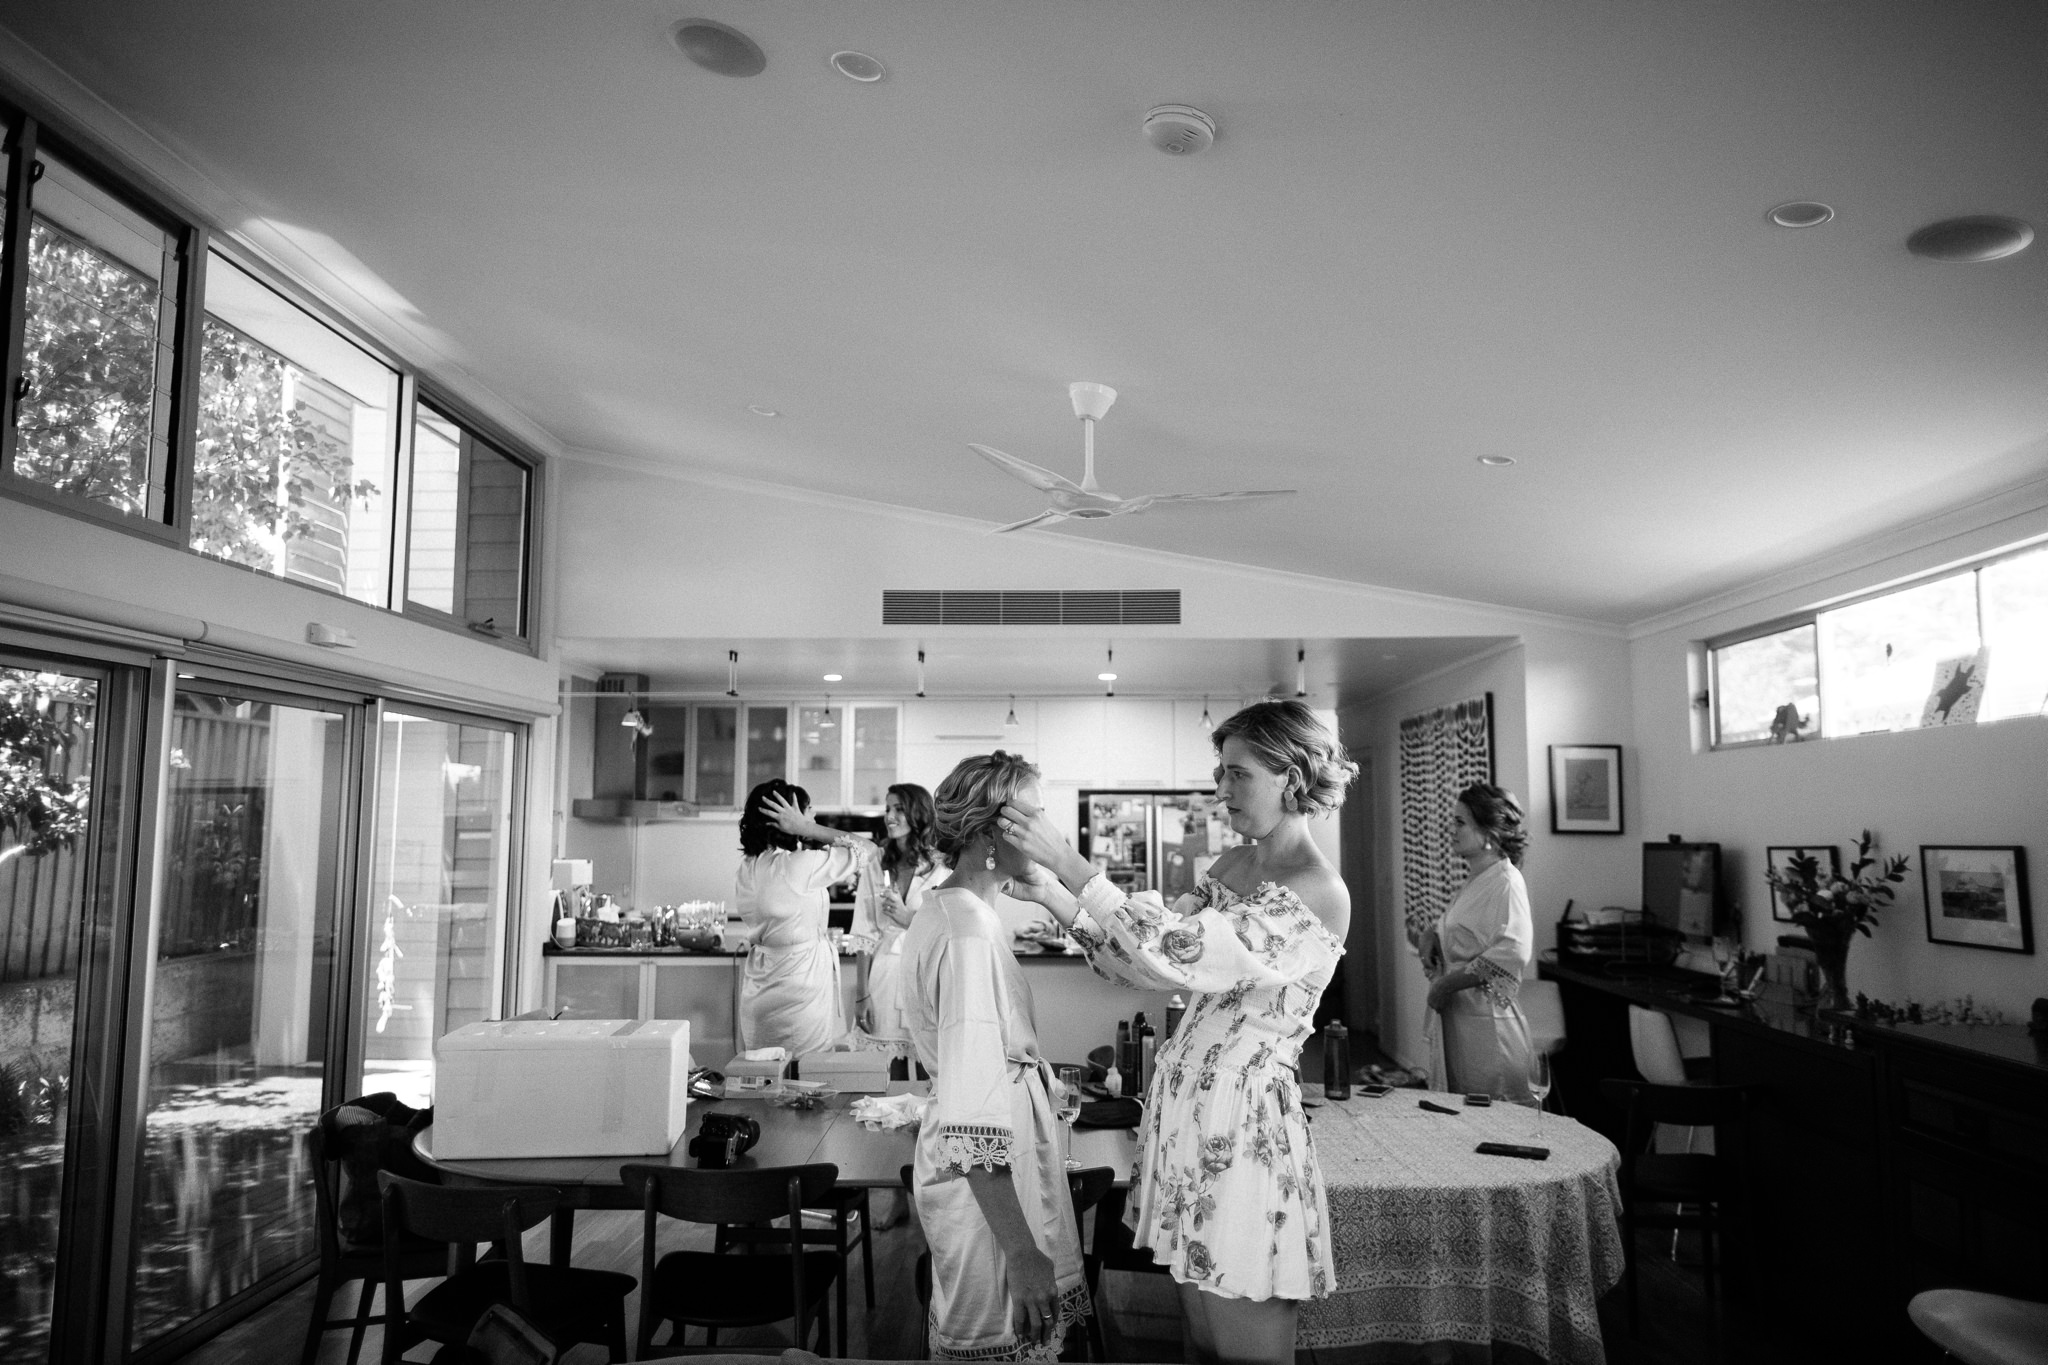 Matilda Bay wedding venue Perth - Tp and Co